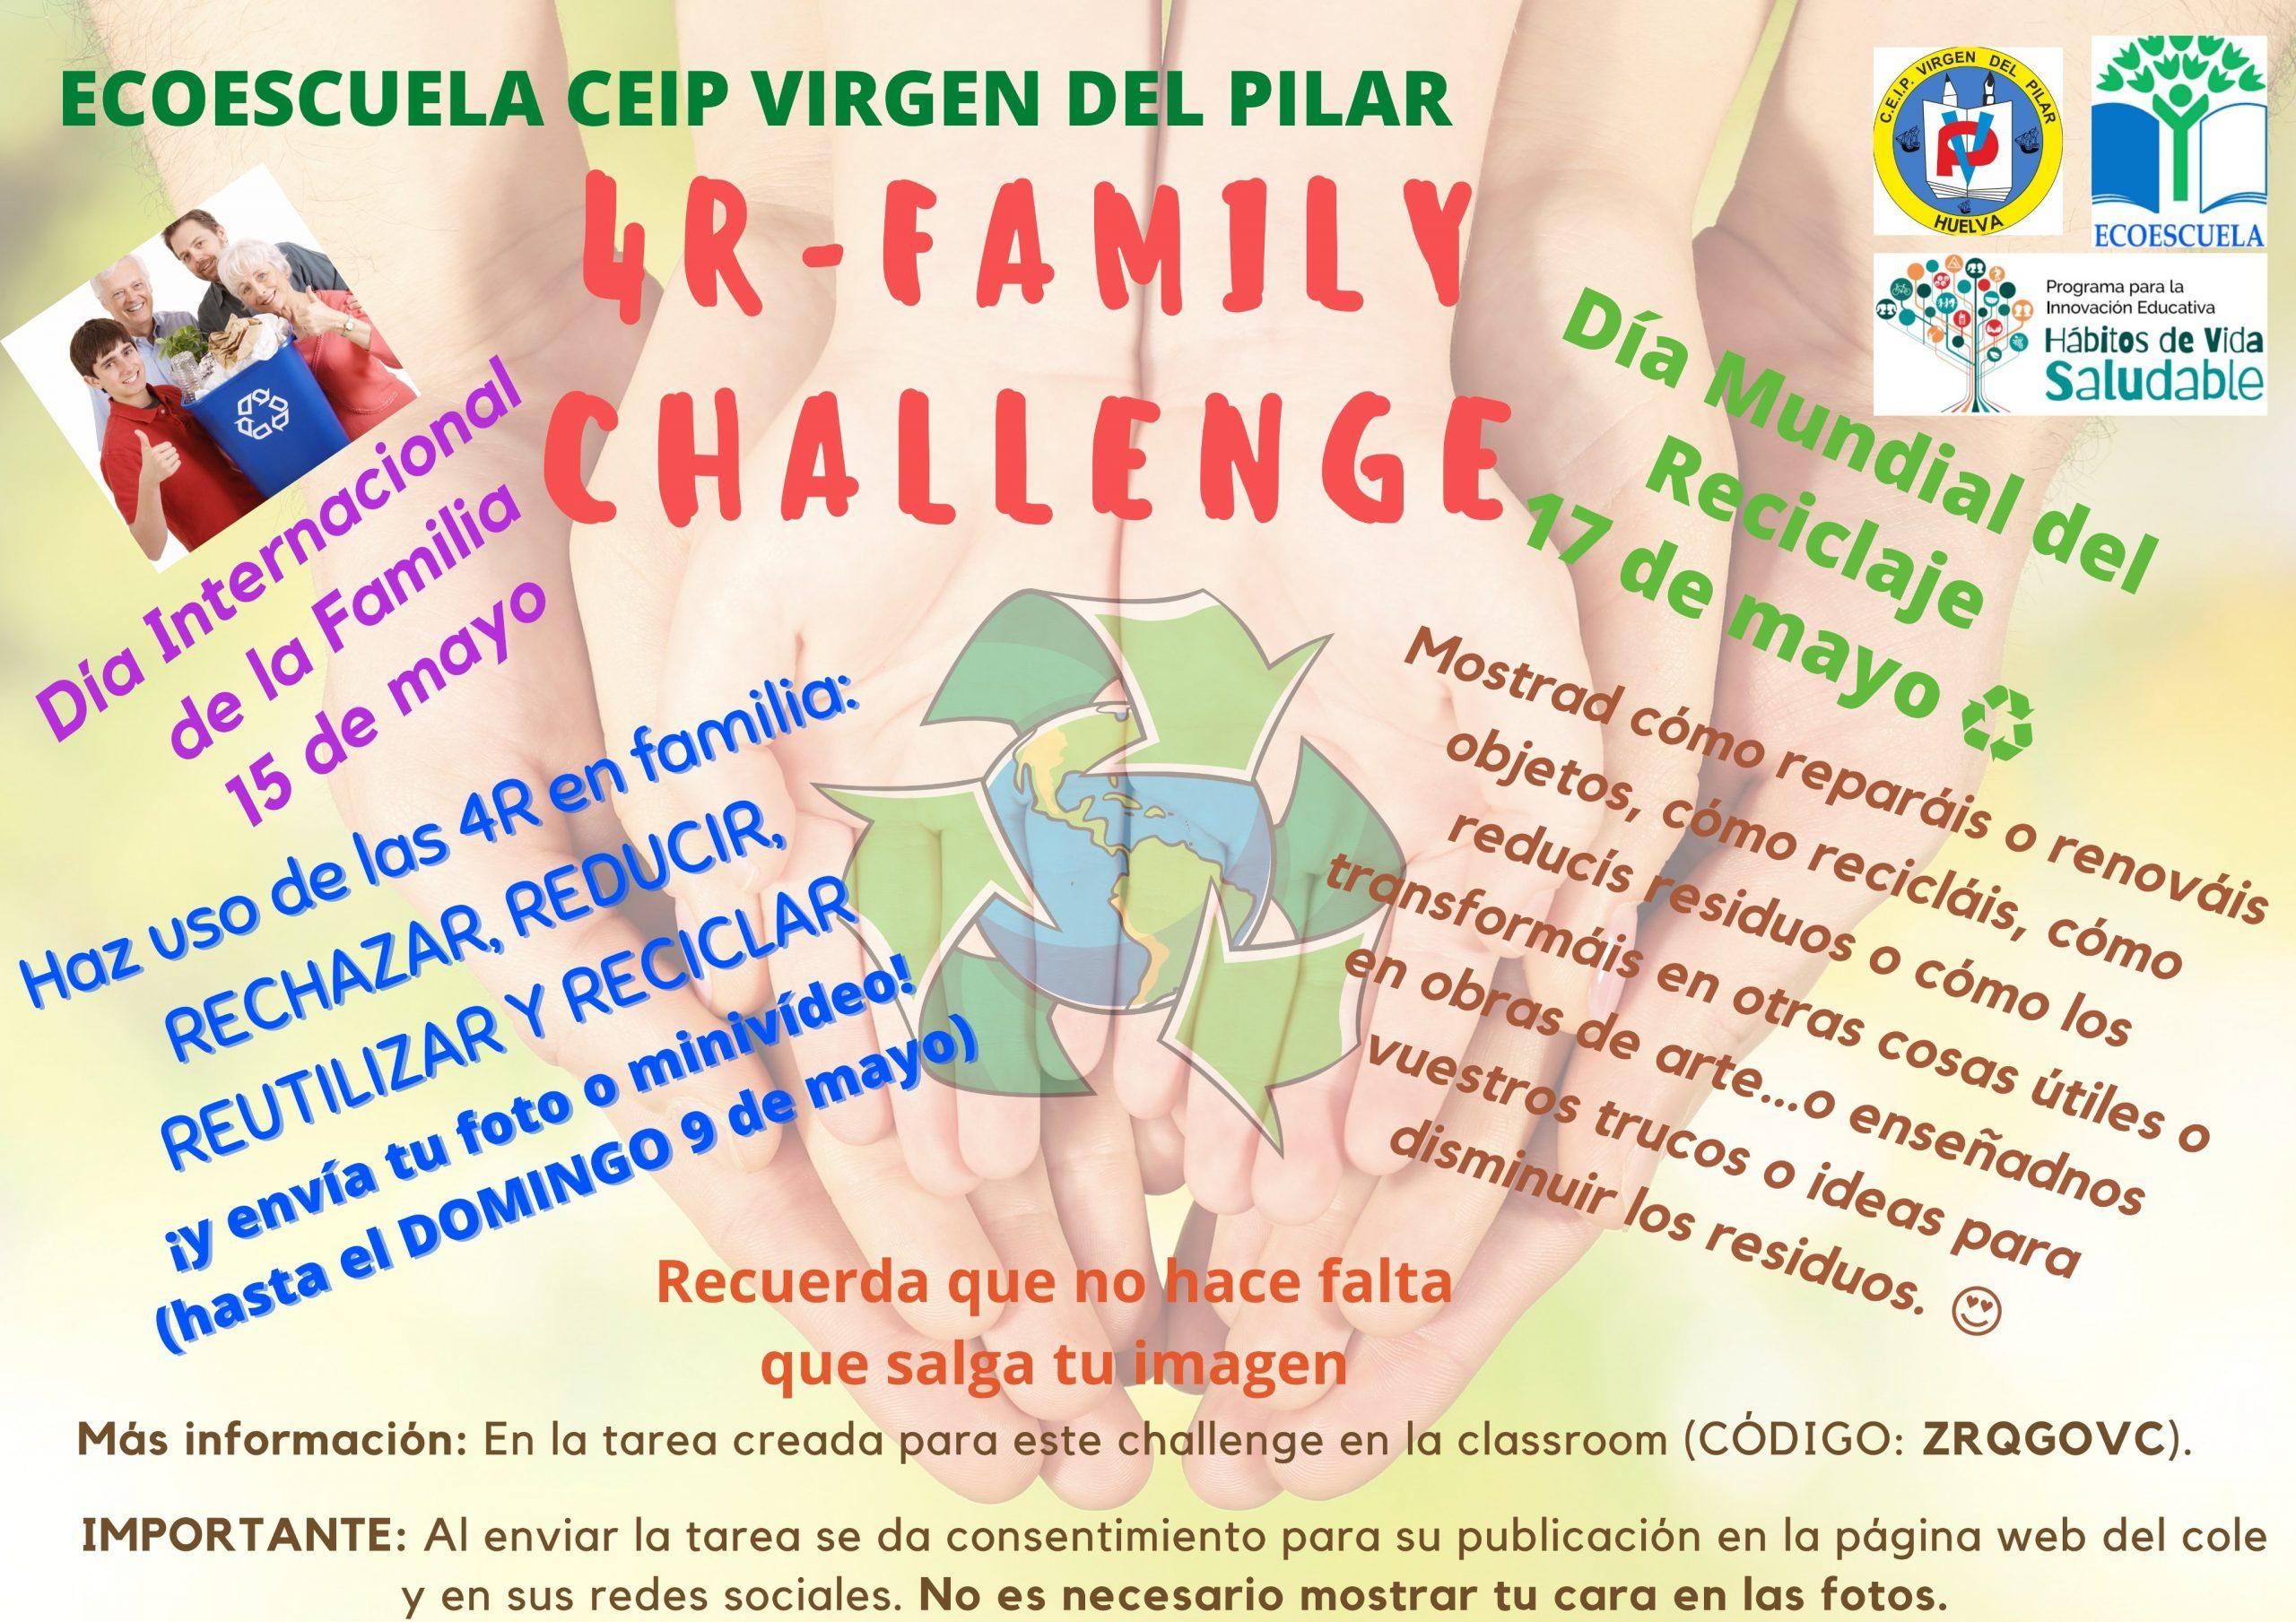 New Virgen del Pilar Challenge!! ¡¡Nuevo Reto!!